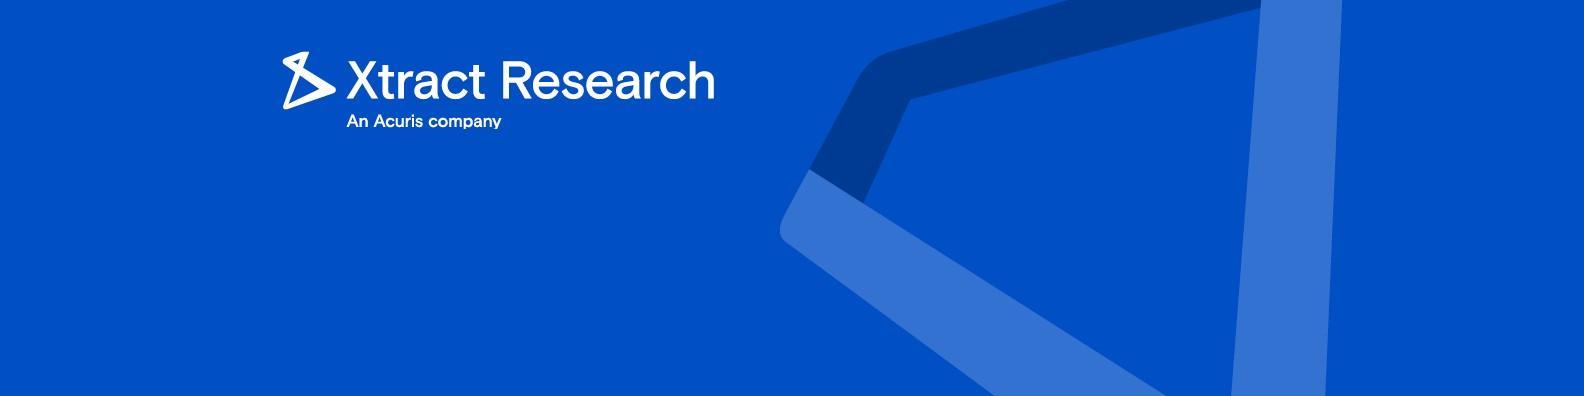 Xtract Research company logo